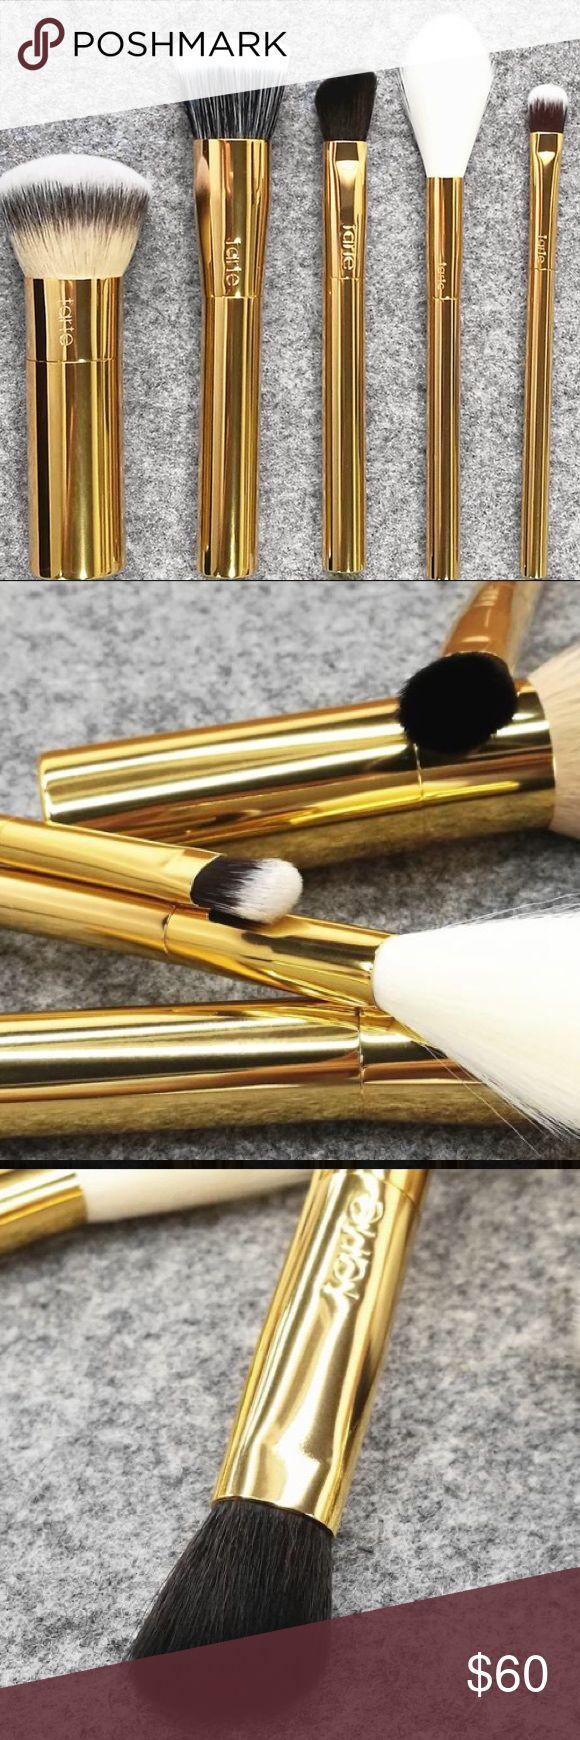 5pc Tarte Gold Handle Brush set 5pc Tarte Brush Set! Tarte Foundation Brush, Highlight Brush, Concealer brush, Blush Brush, Eyeshadow Brush! tarte Makeup Brushes & Tools